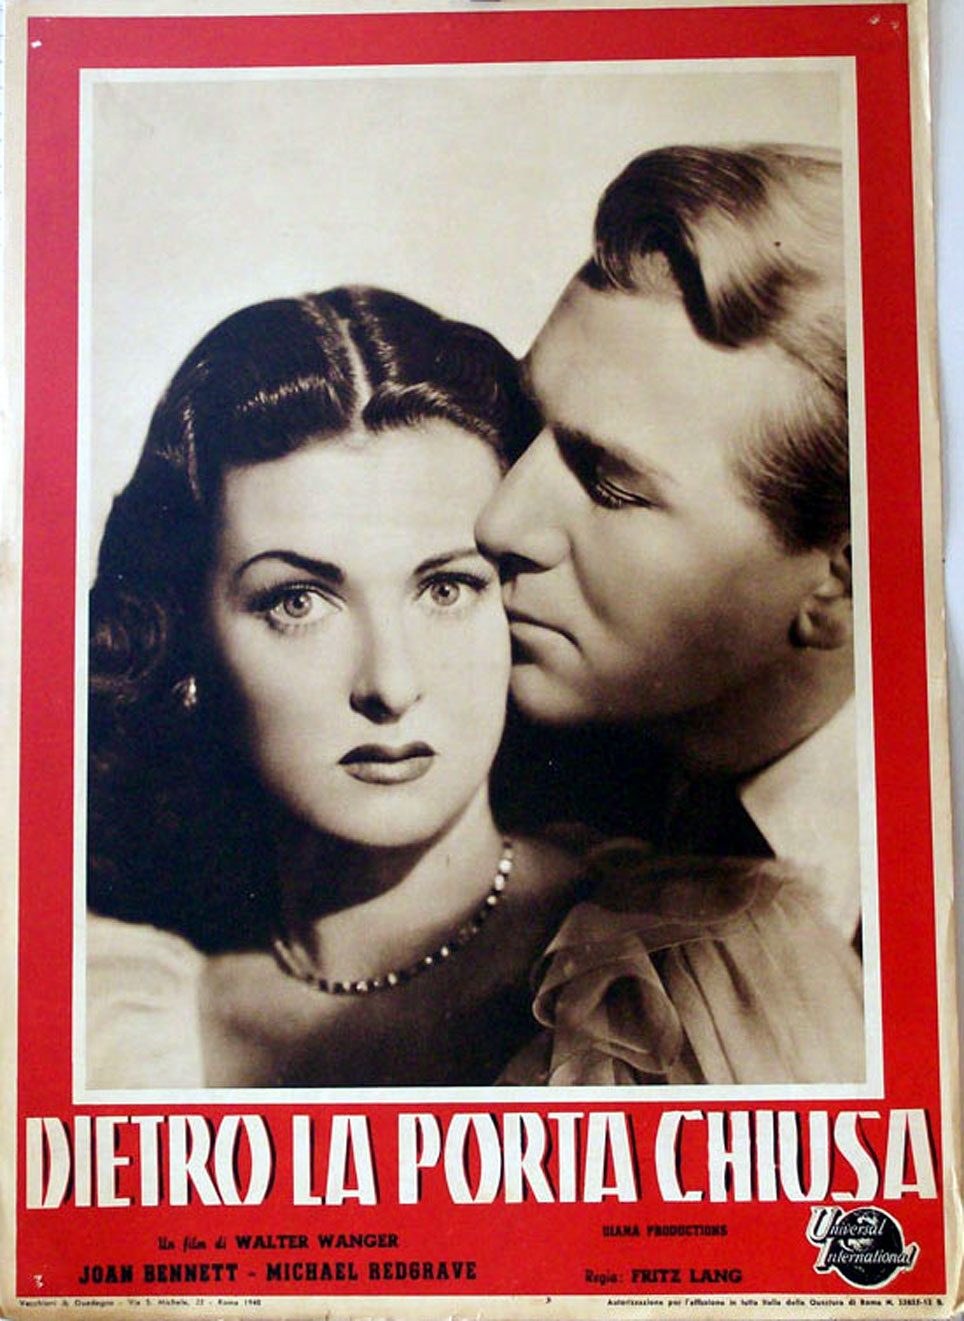 Dietro la porta chiusa movie poster secret beyond the - Dietro la porta chiusa film completo ...